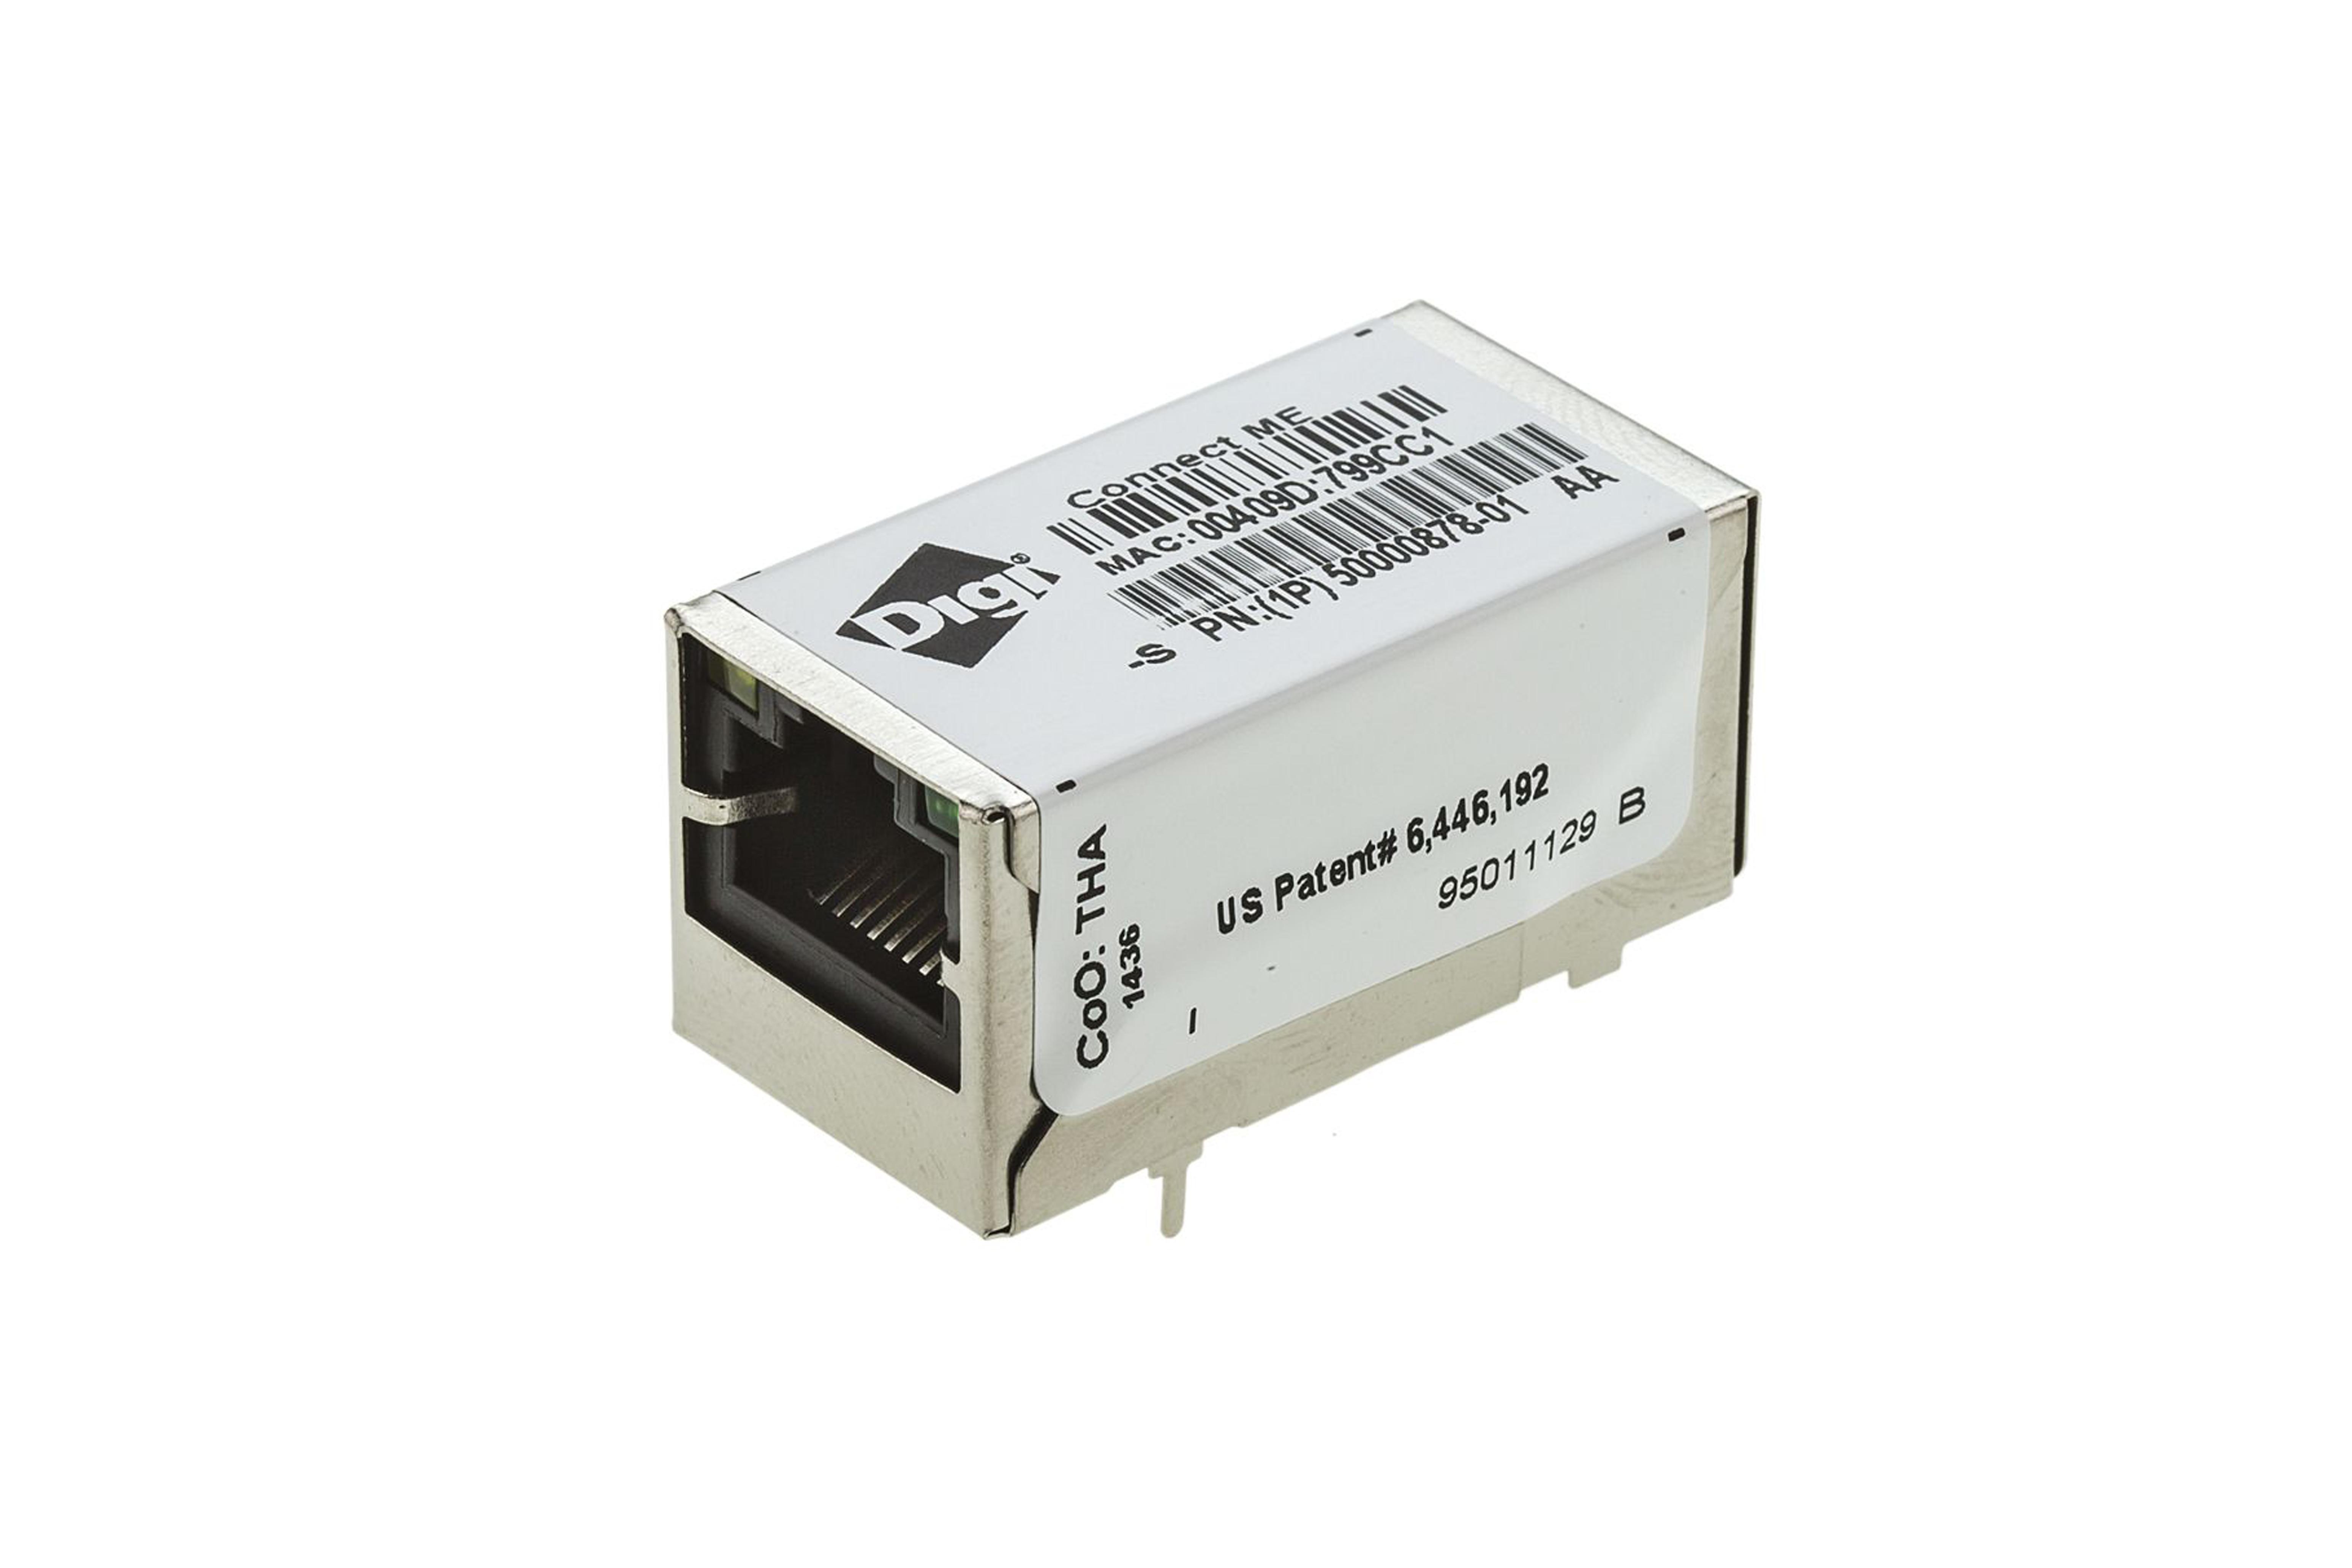 Connect Me Modulo standard F/W 2MB Flash